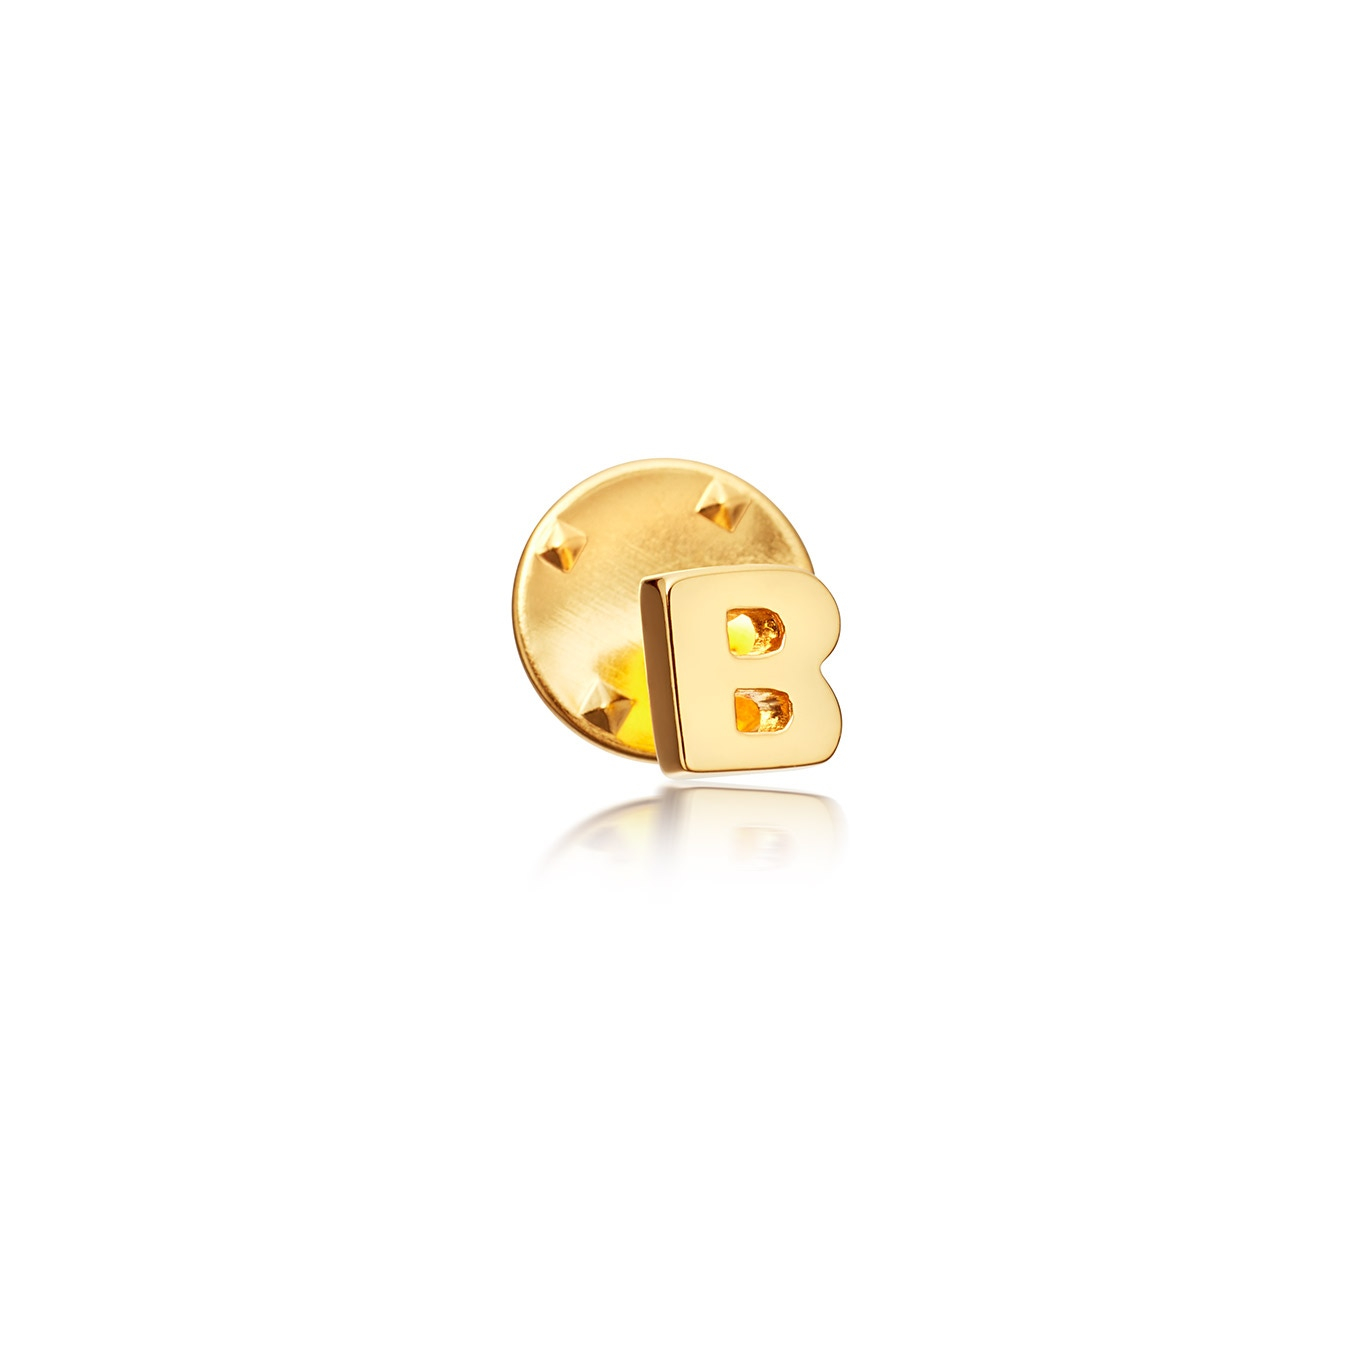 Initial 'B' Biography Pin